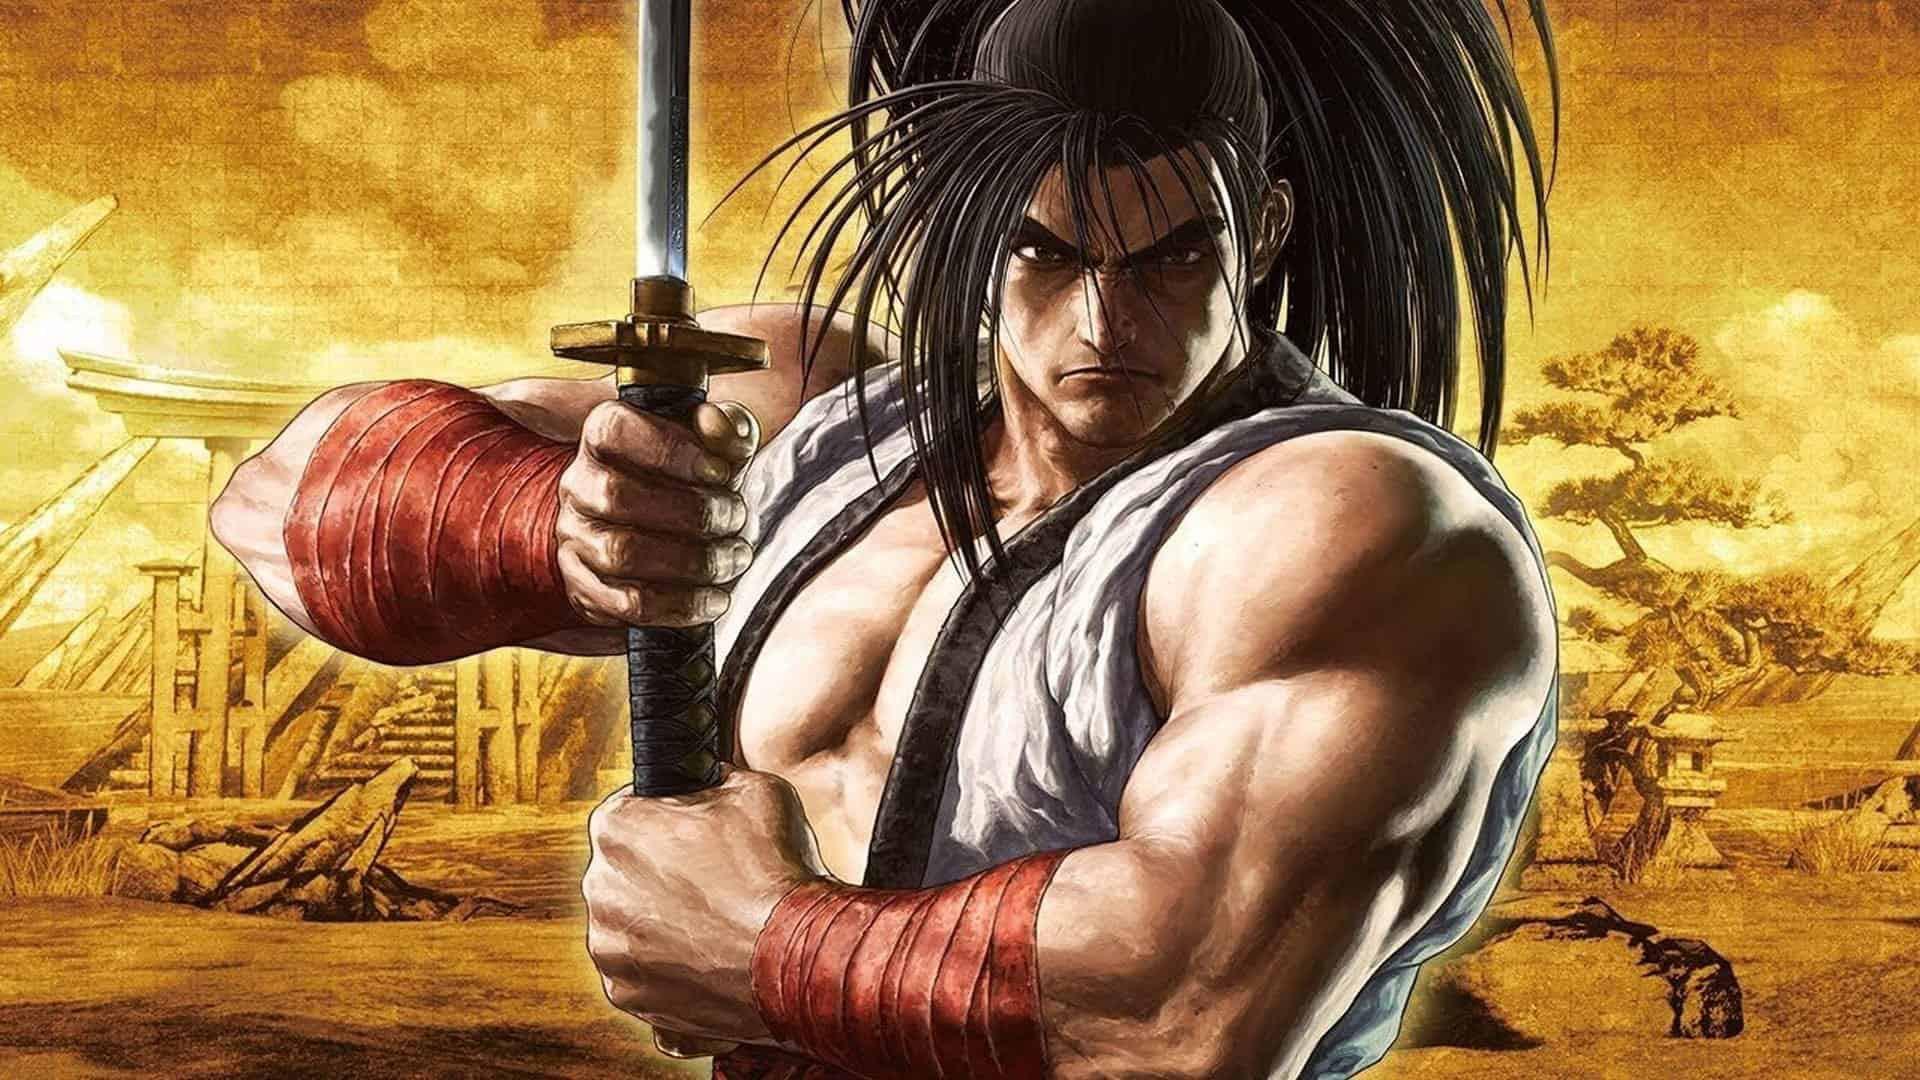 Samurai Shodown 05 - بازی Samurai Shodown مخصوص PS4